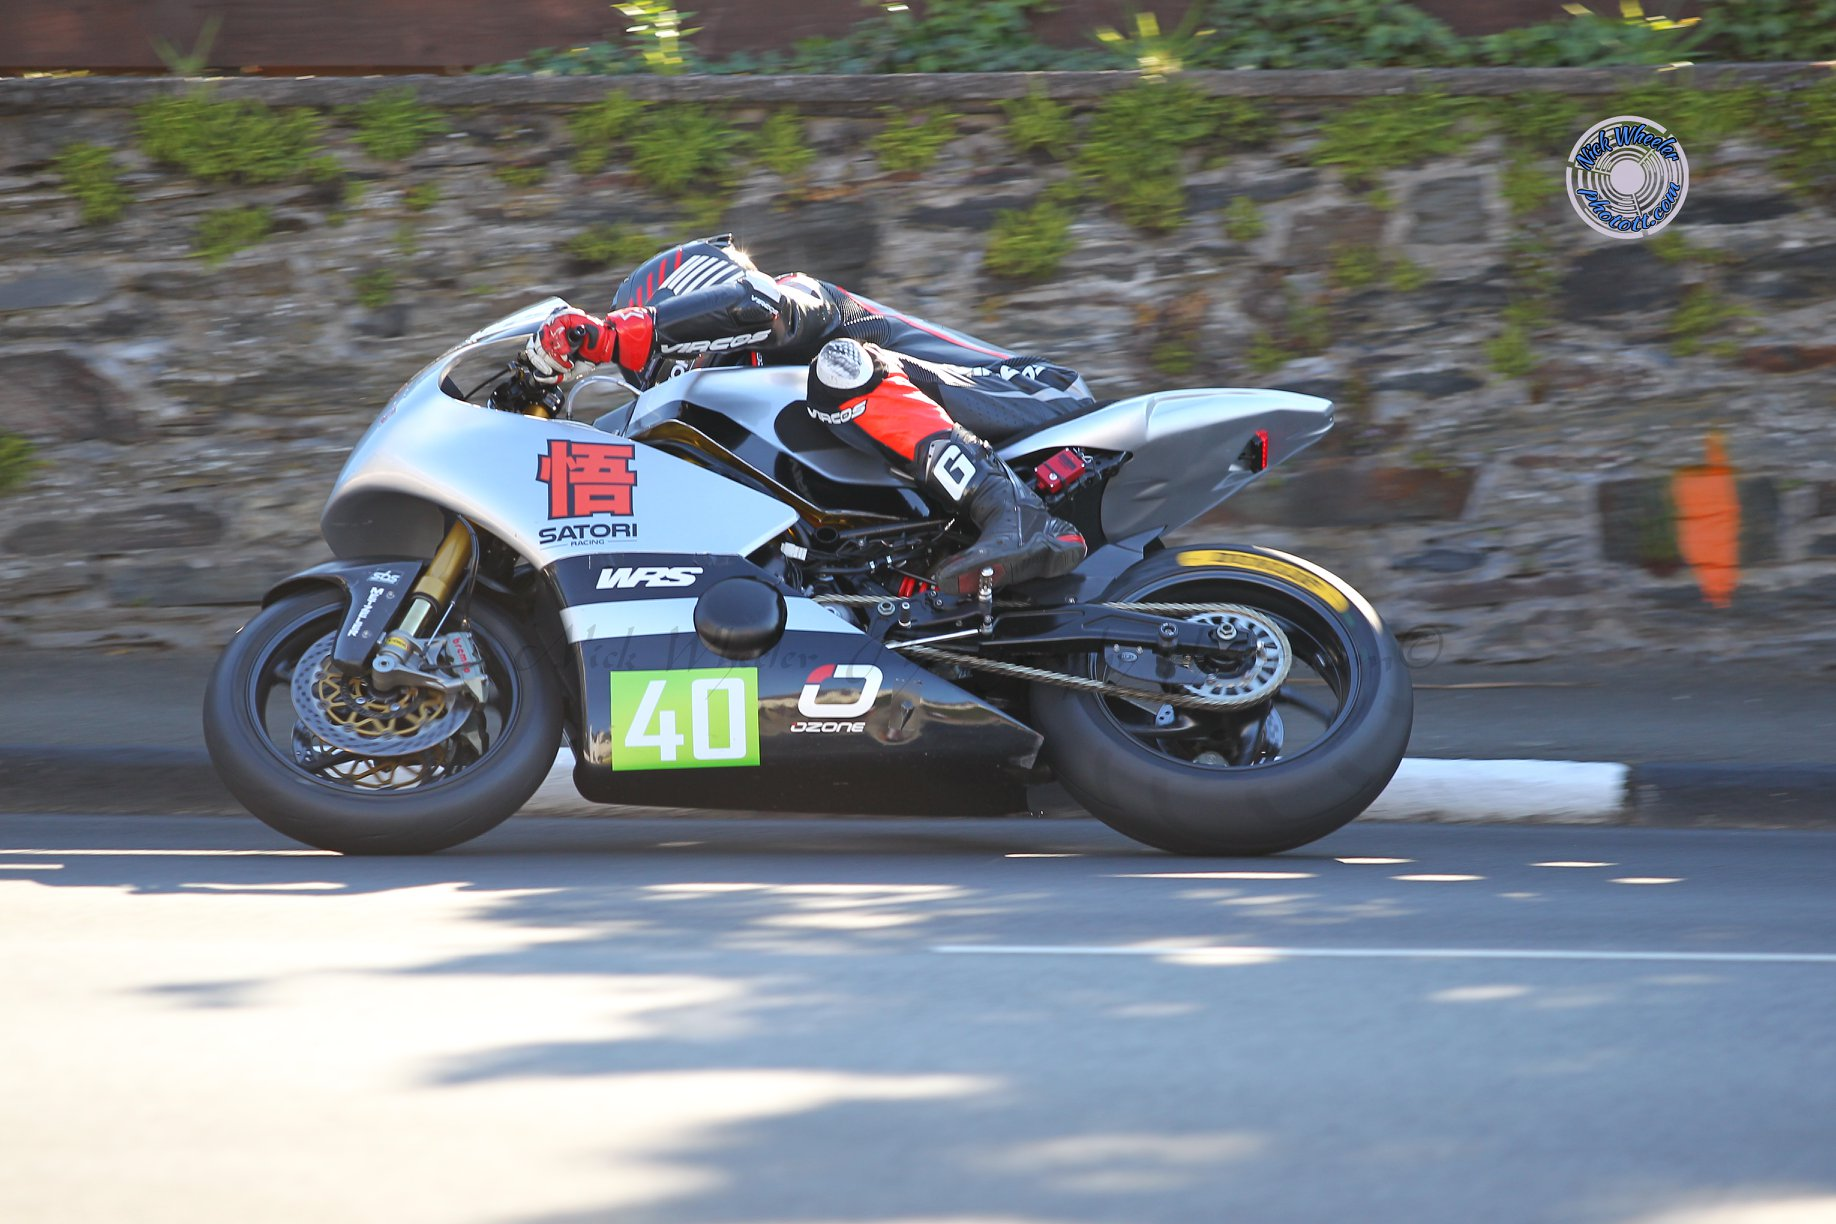 Manx GP Top 6: Rob Whittall